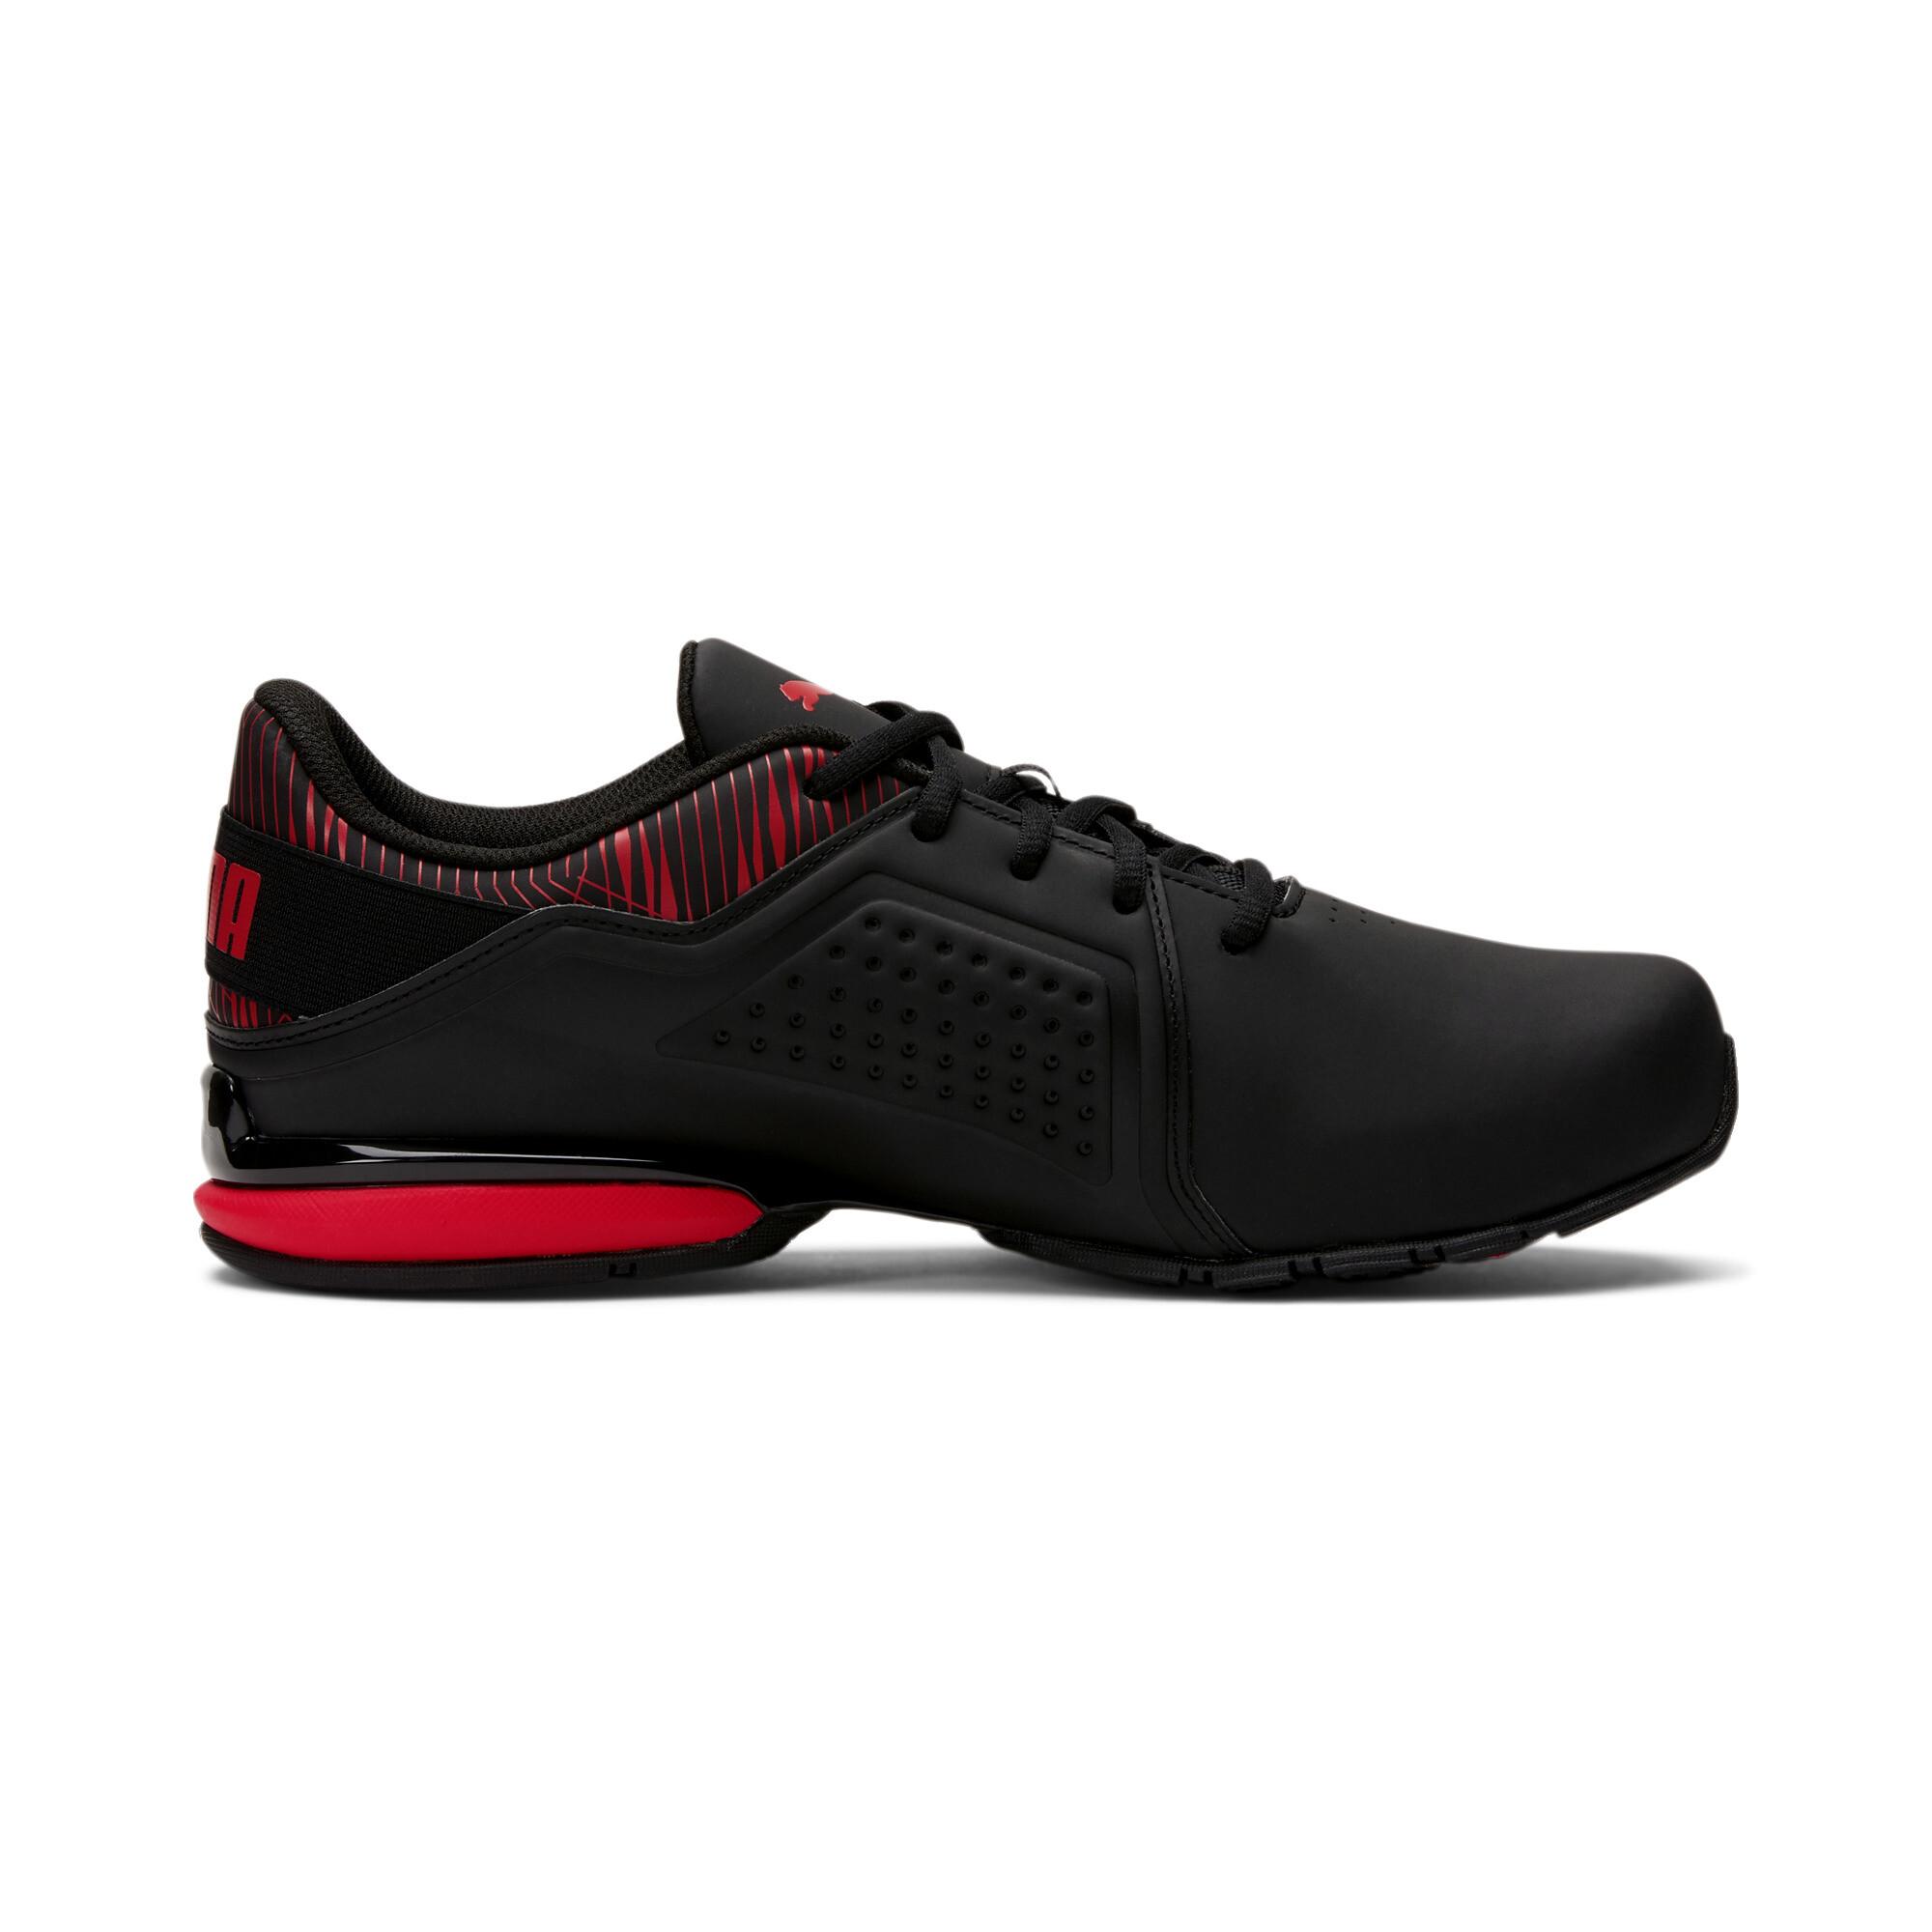 PUMA-Men-039-s-Viz-Runner-Graphic-Sneakers thumbnail 35